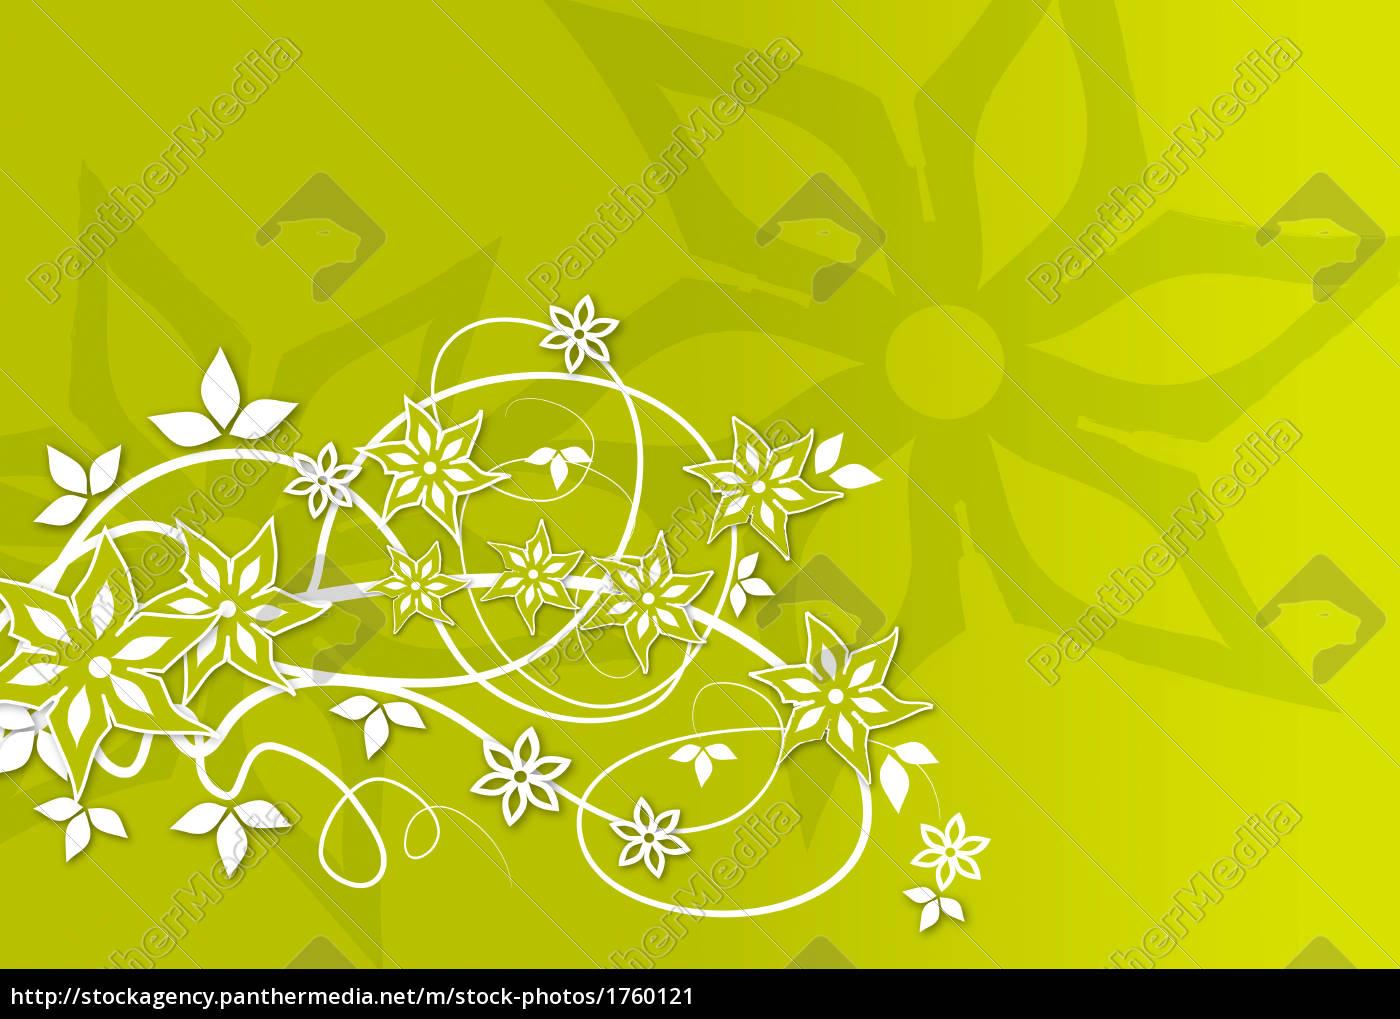 floral, background, - 1760121